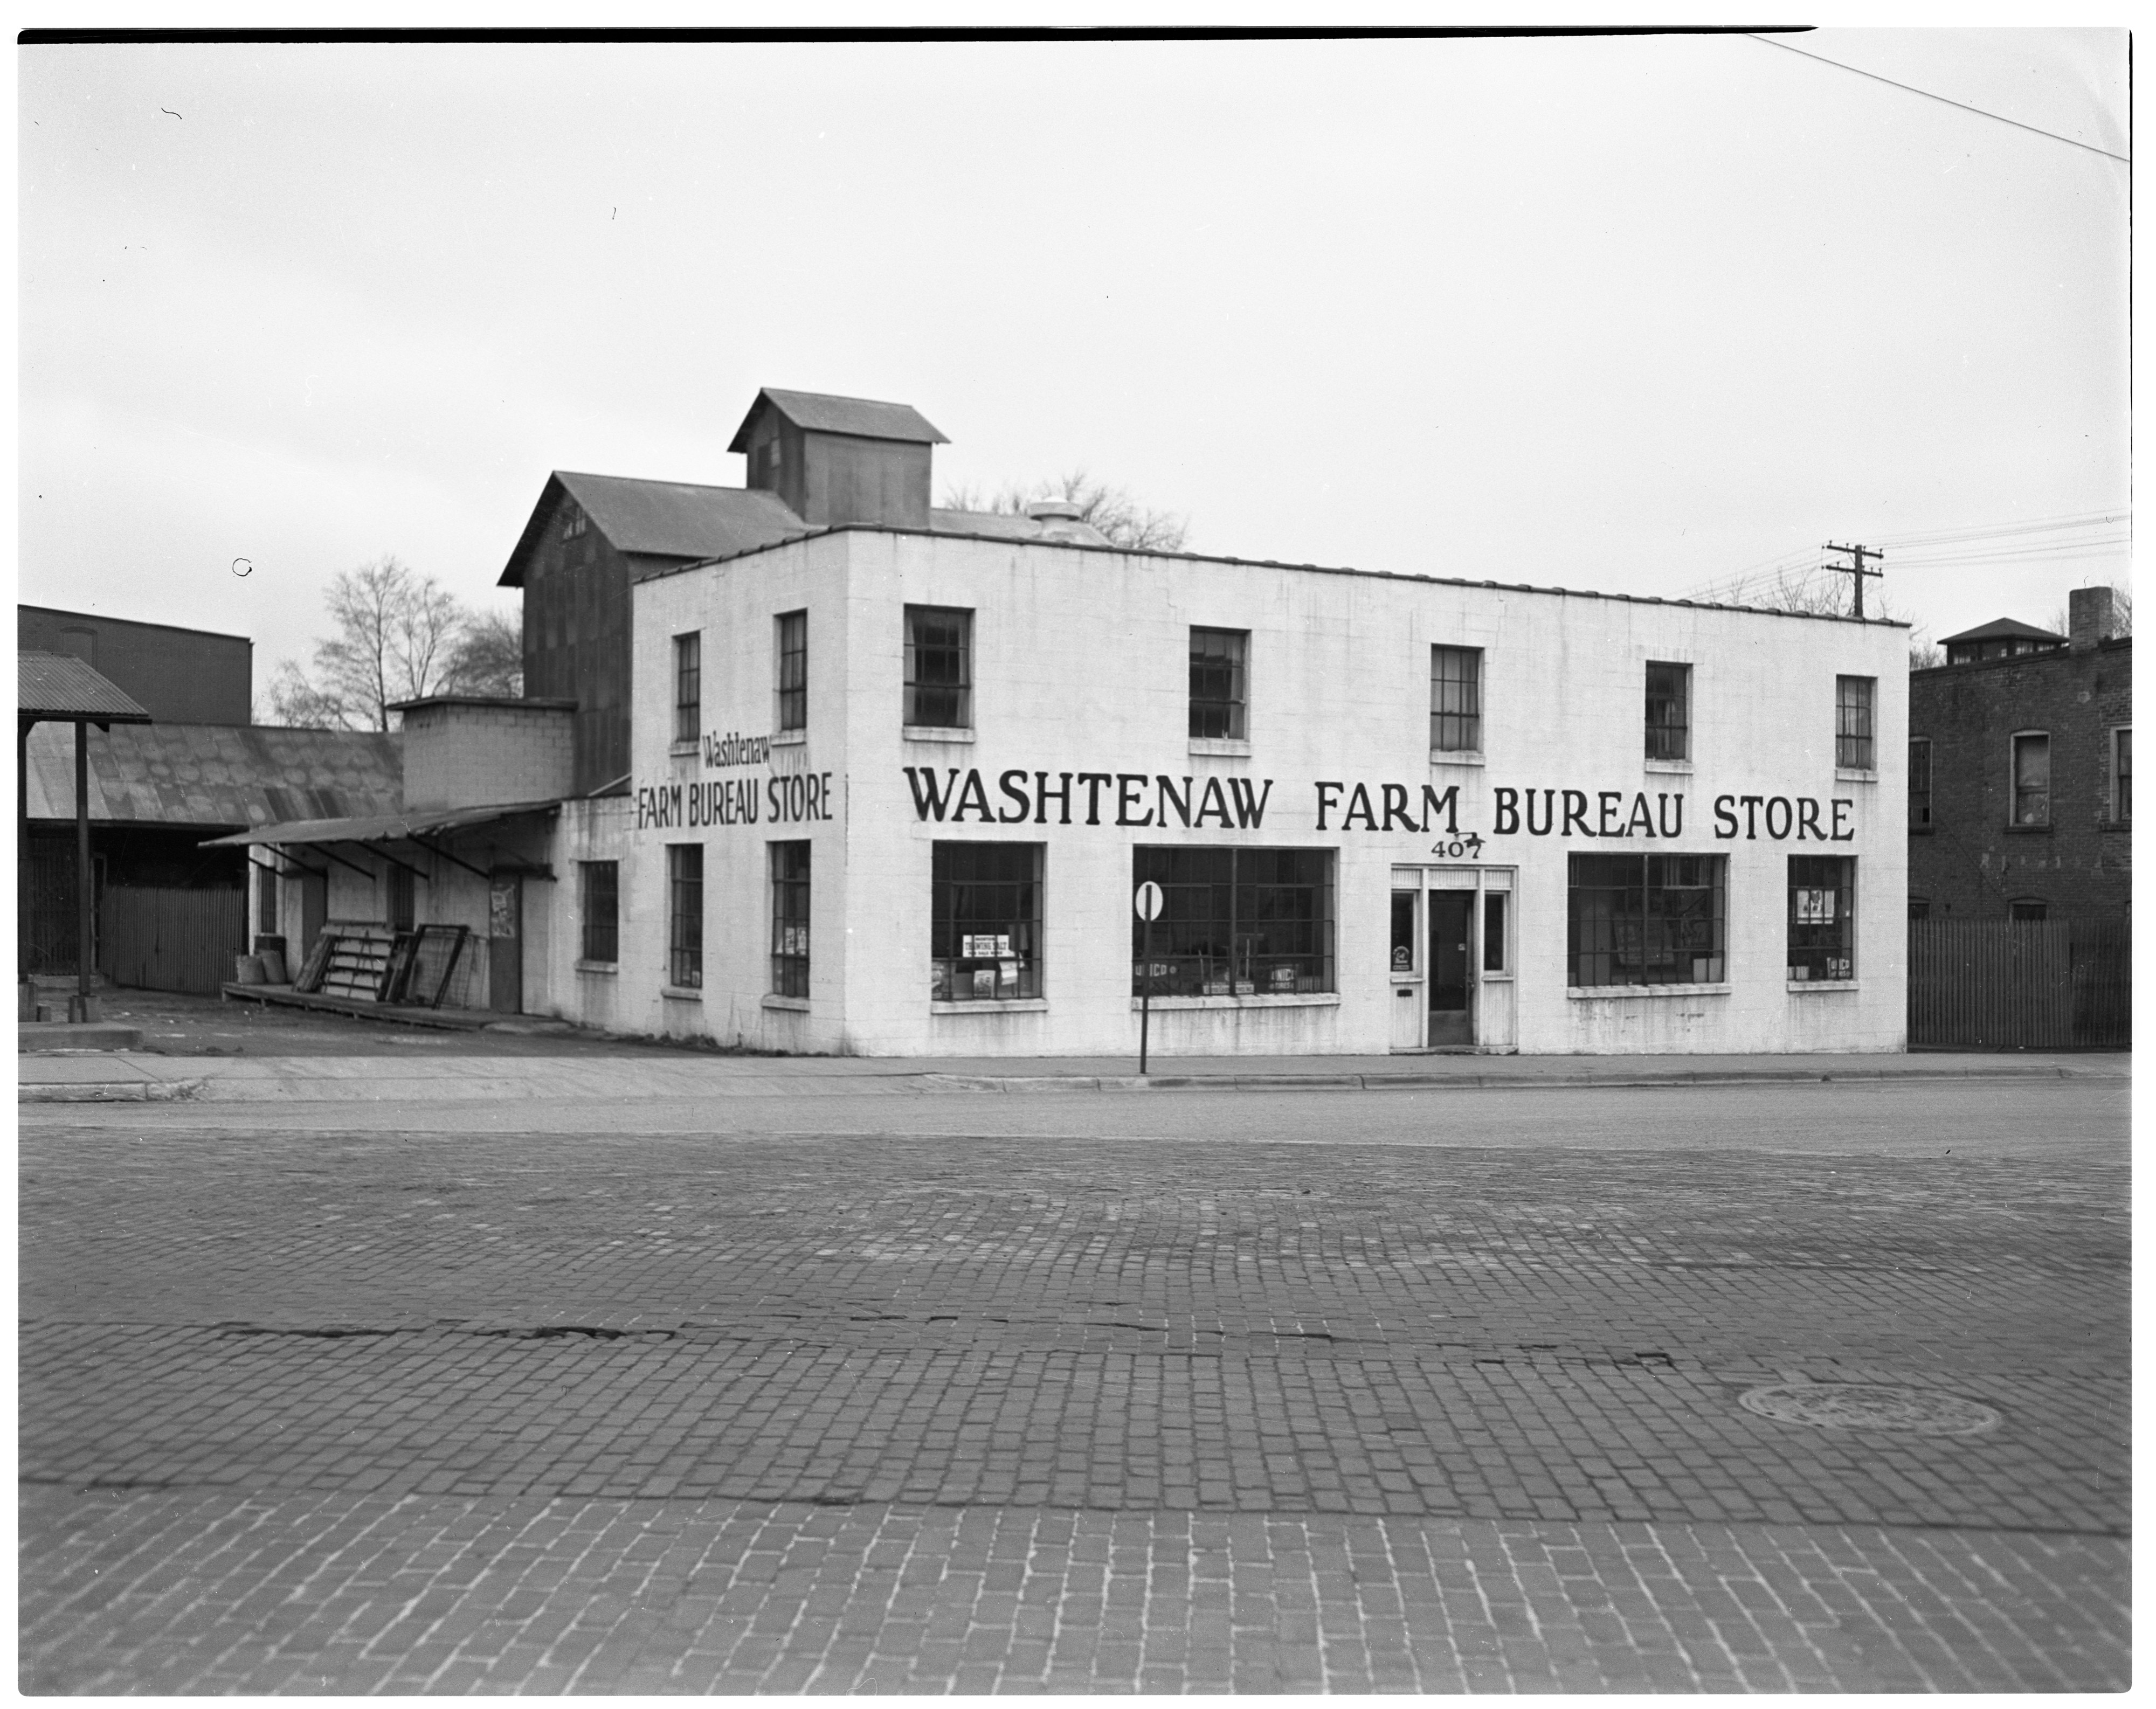 washtenaw farm bureau store 1951 old news. Black Bedroom Furniture Sets. Home Design Ideas